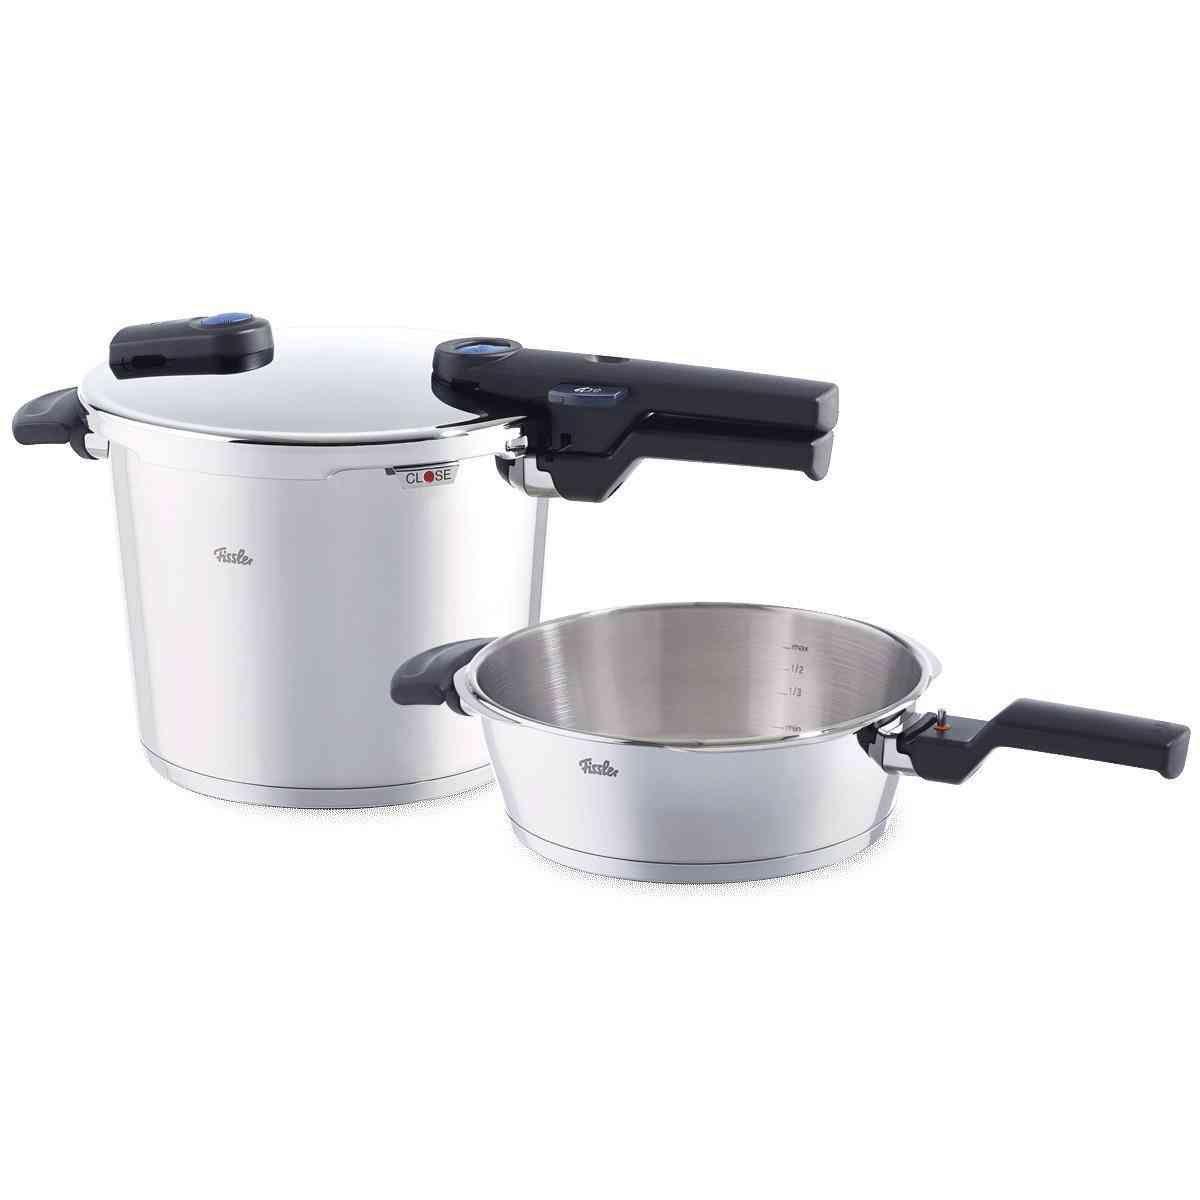 vitaquick pressure cooker 2-piece set 22 cm / 6,0 + 2,5 ltr.